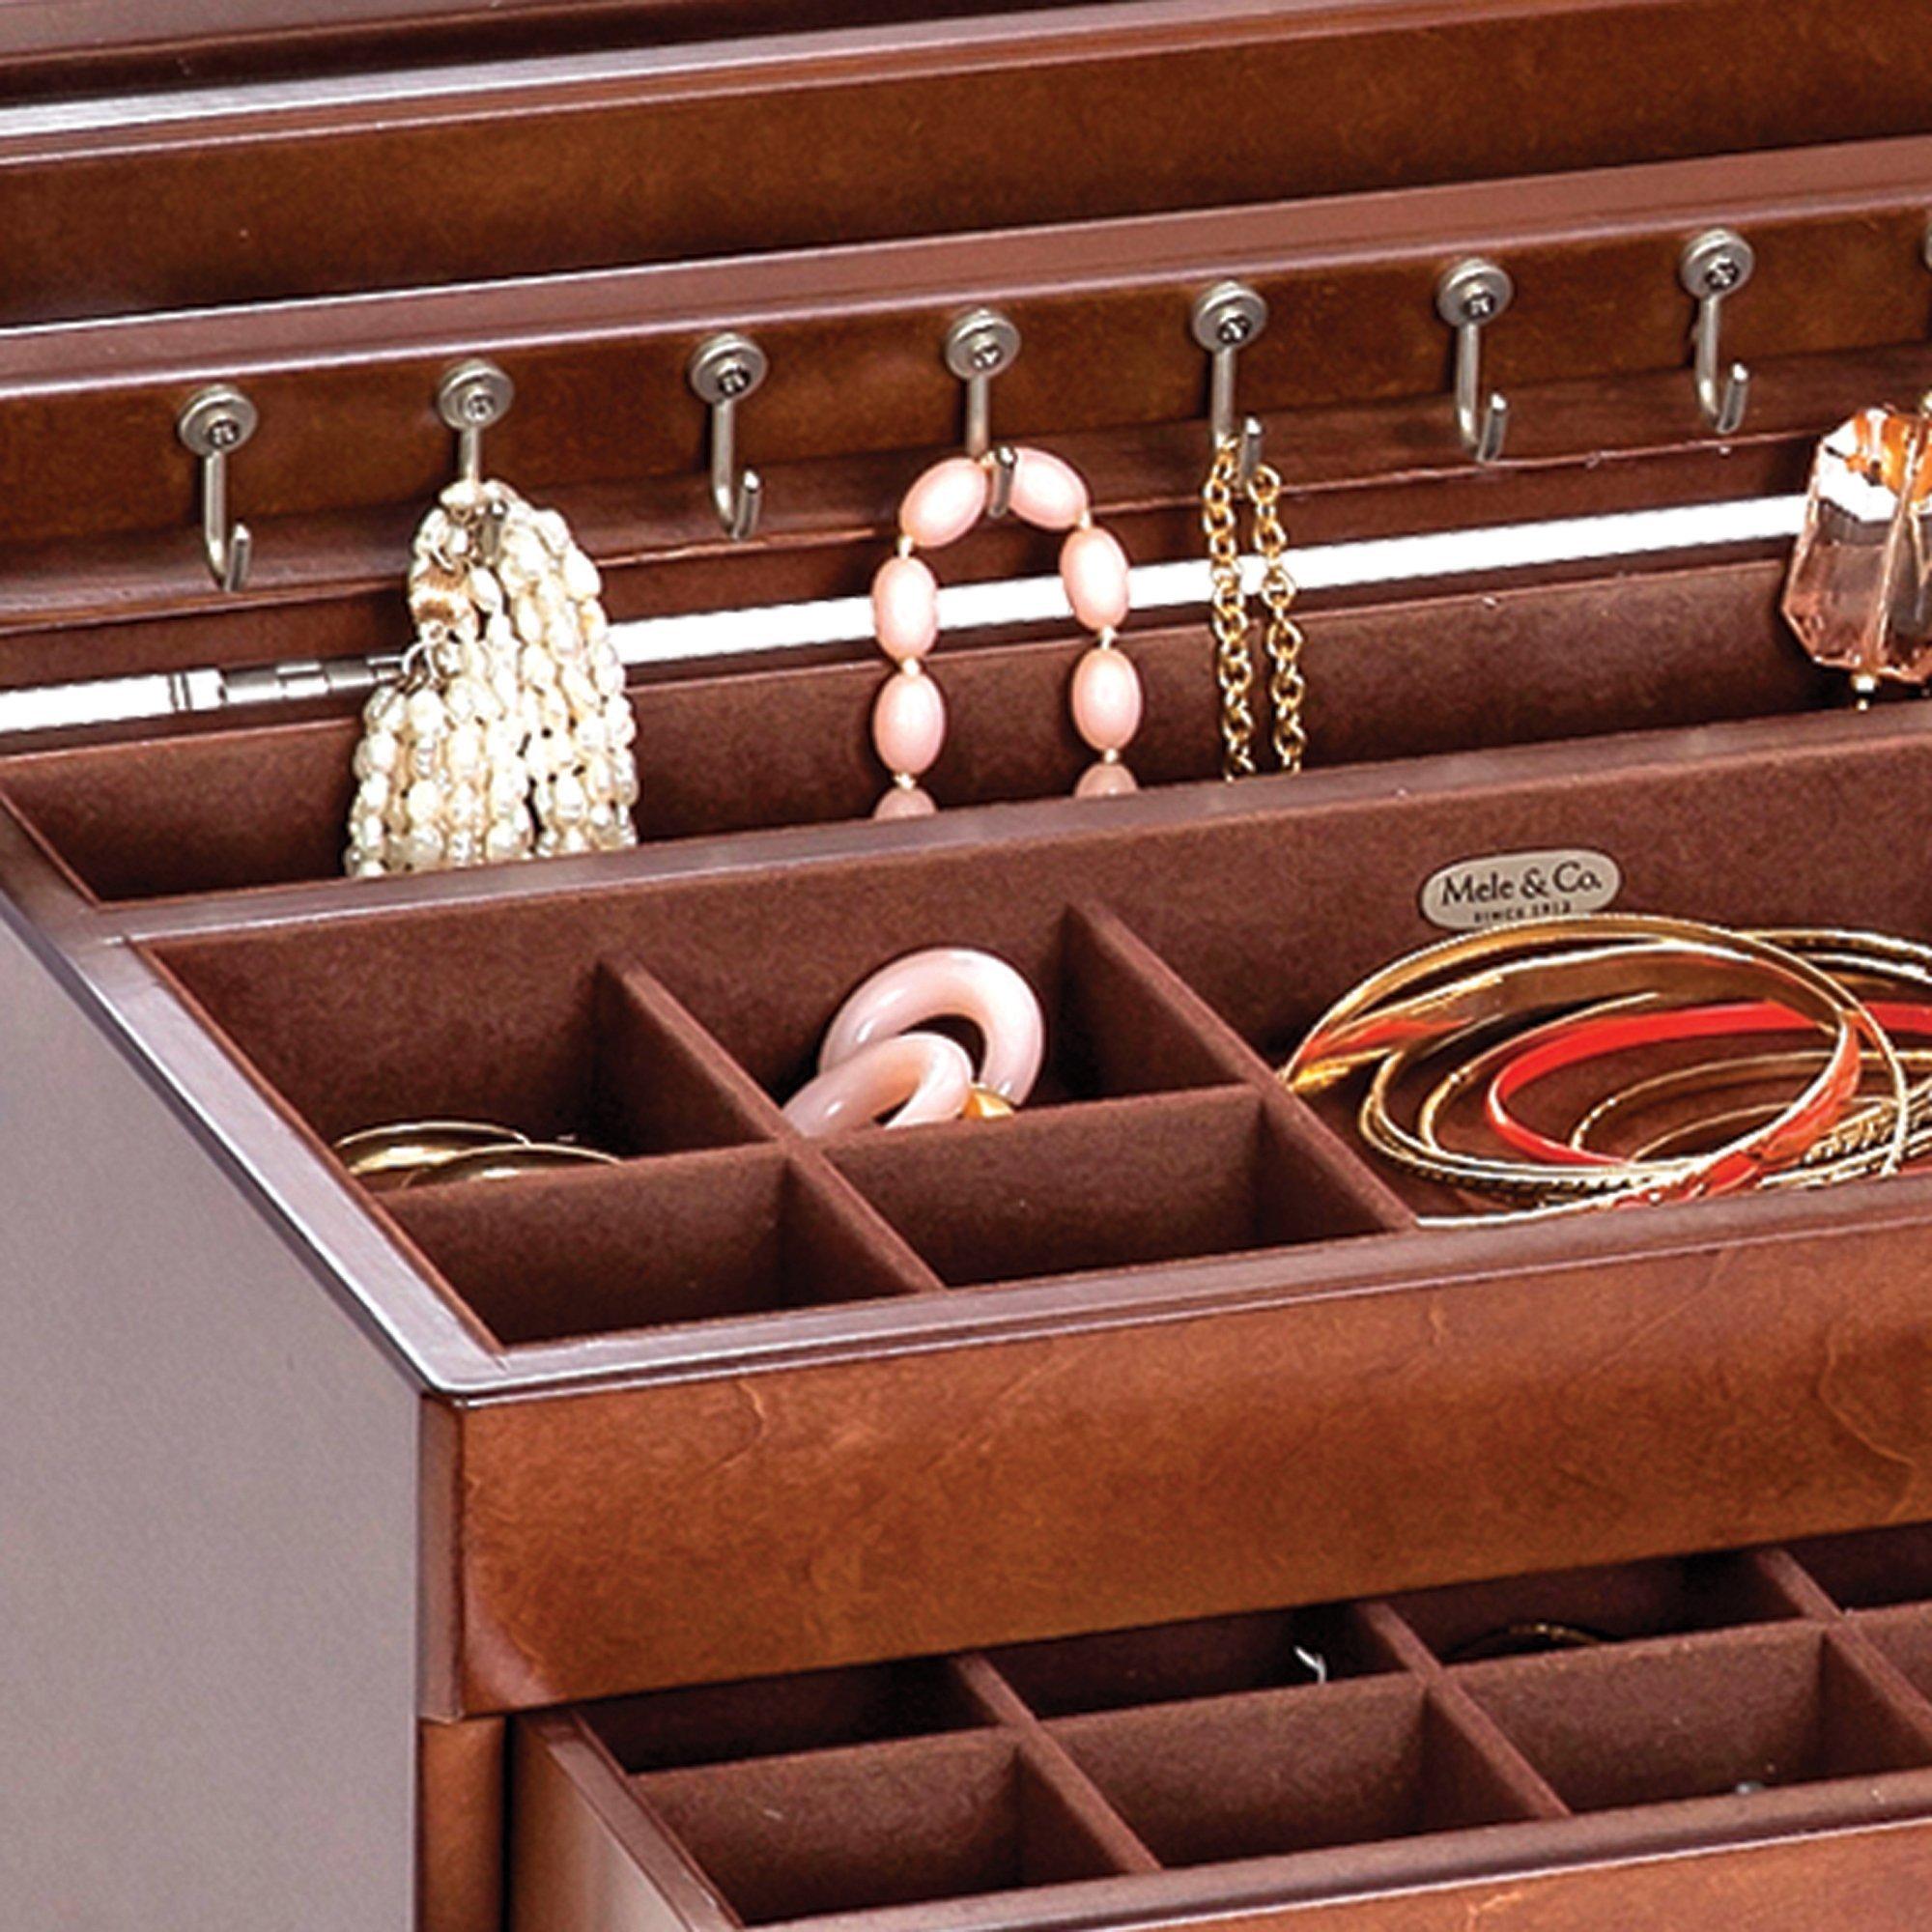 Mele & Co Brigitte Wooden Jewelry Box by Mele & Co. (Image #3)